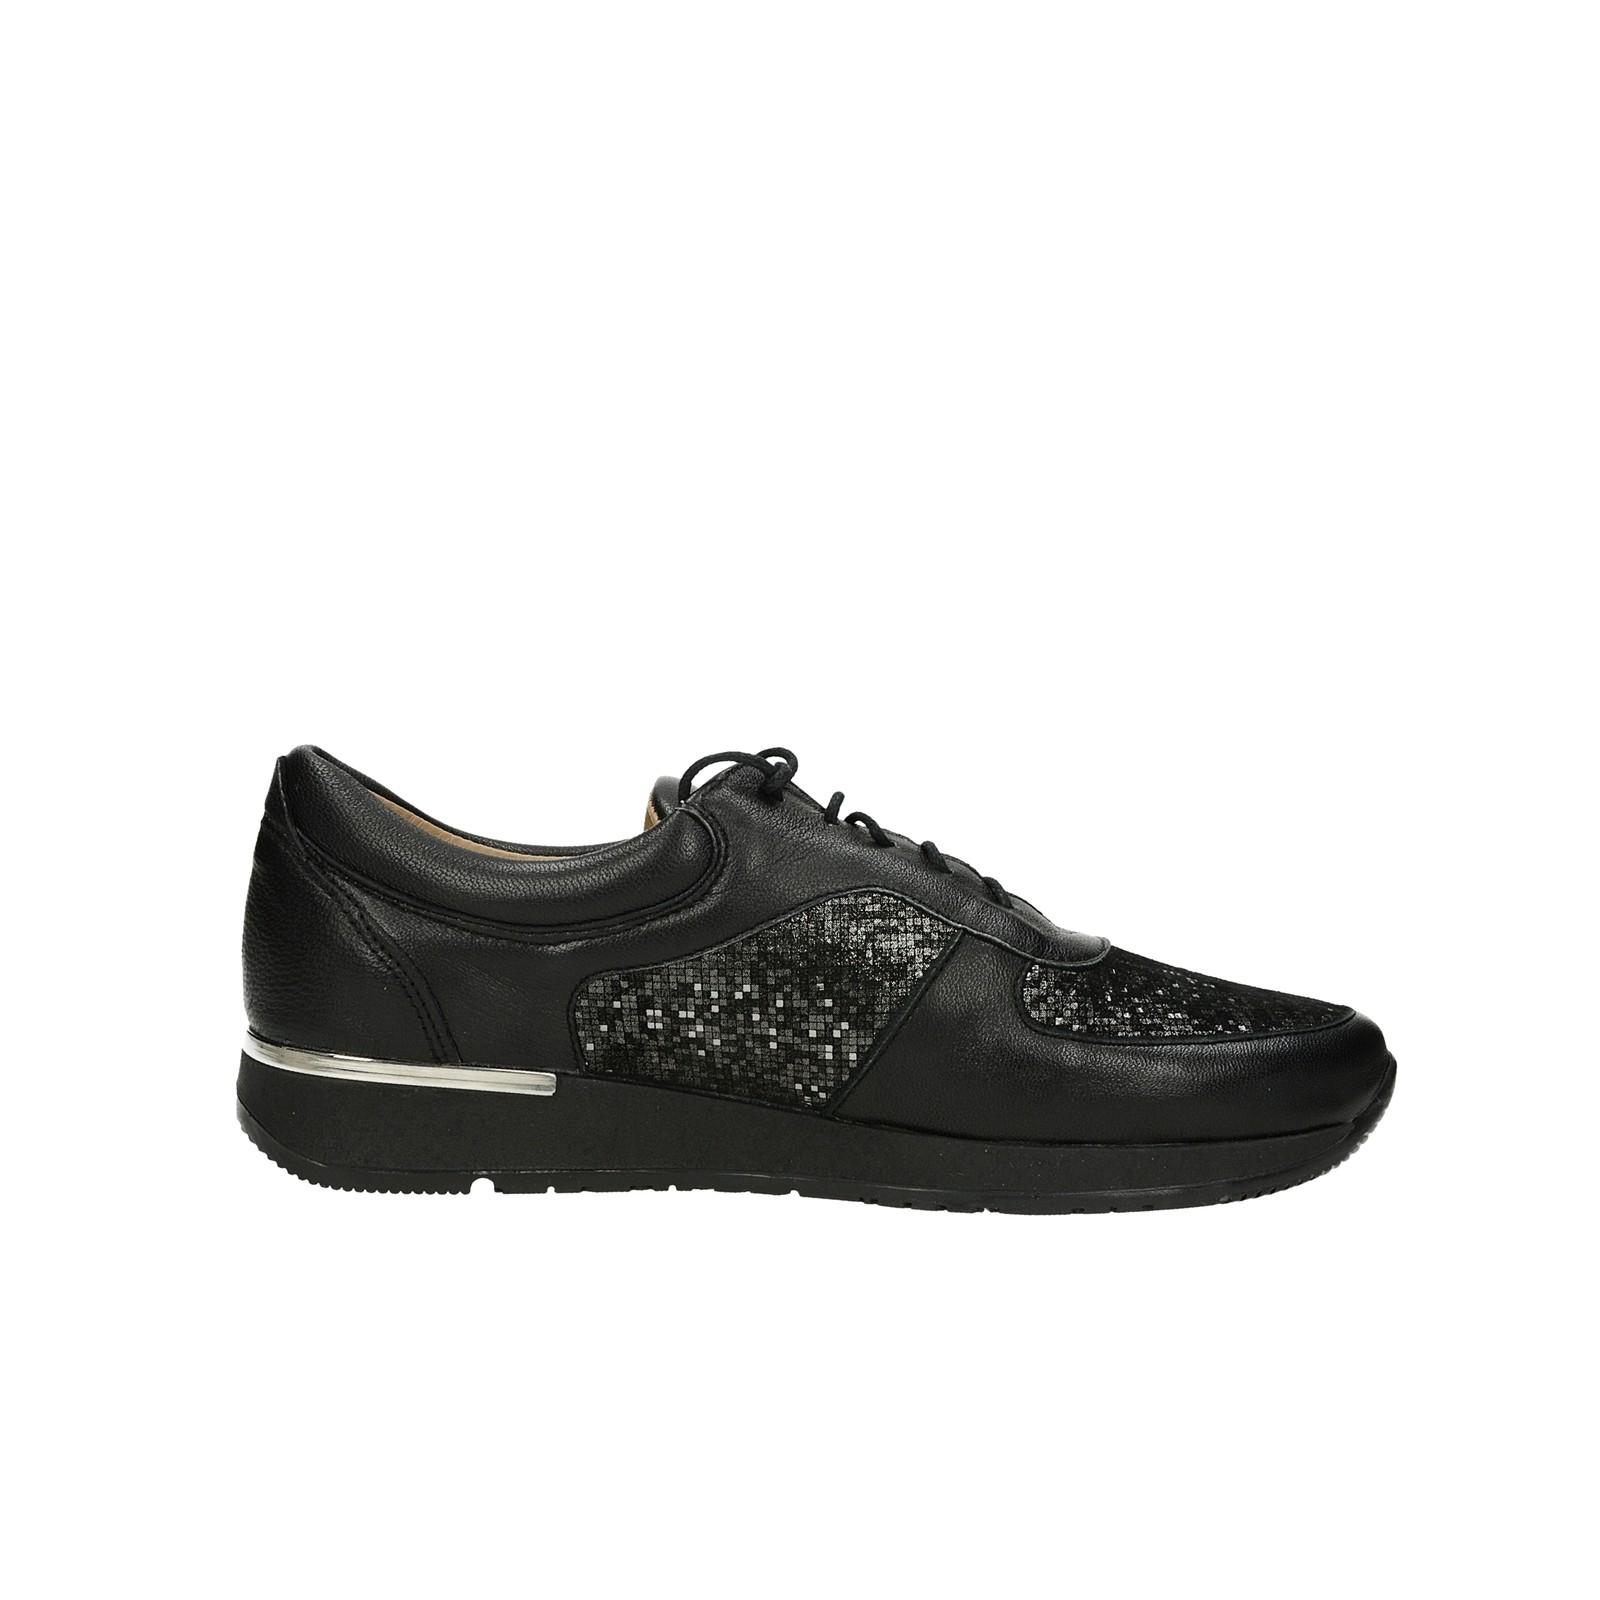 Olivia shoes dámske kožené tenisky - čierne ... 654175dbd53